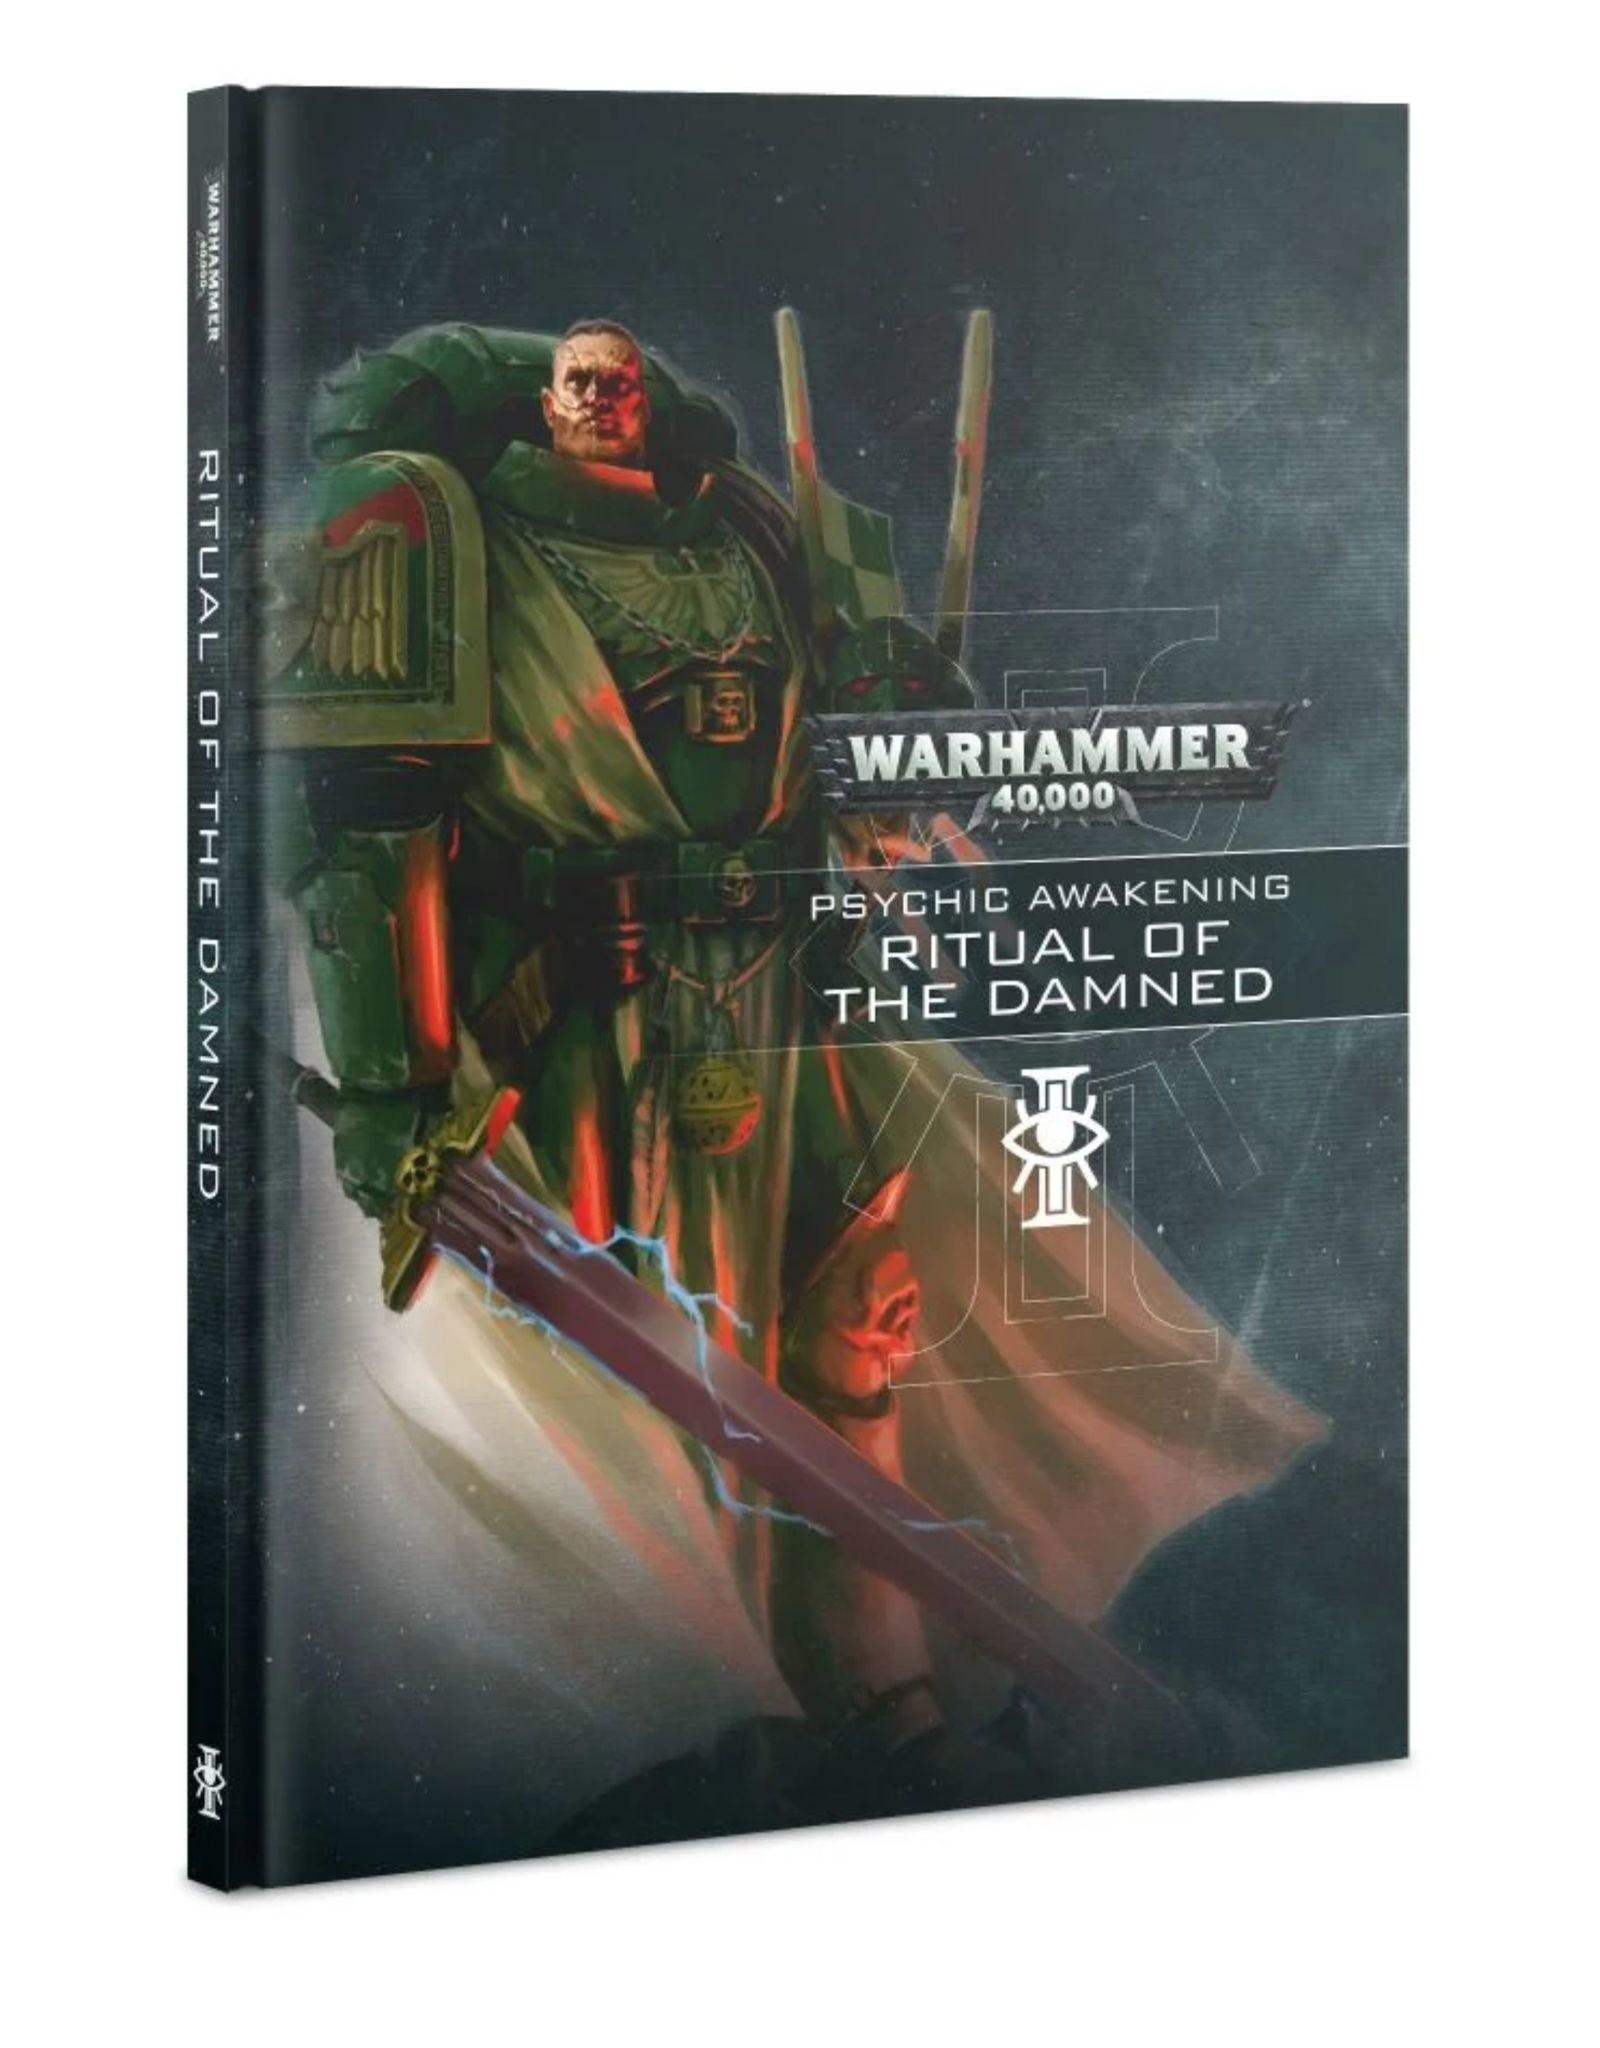 Warhammer 40k Ritual of the Damned - Psychic Awakening Book 4